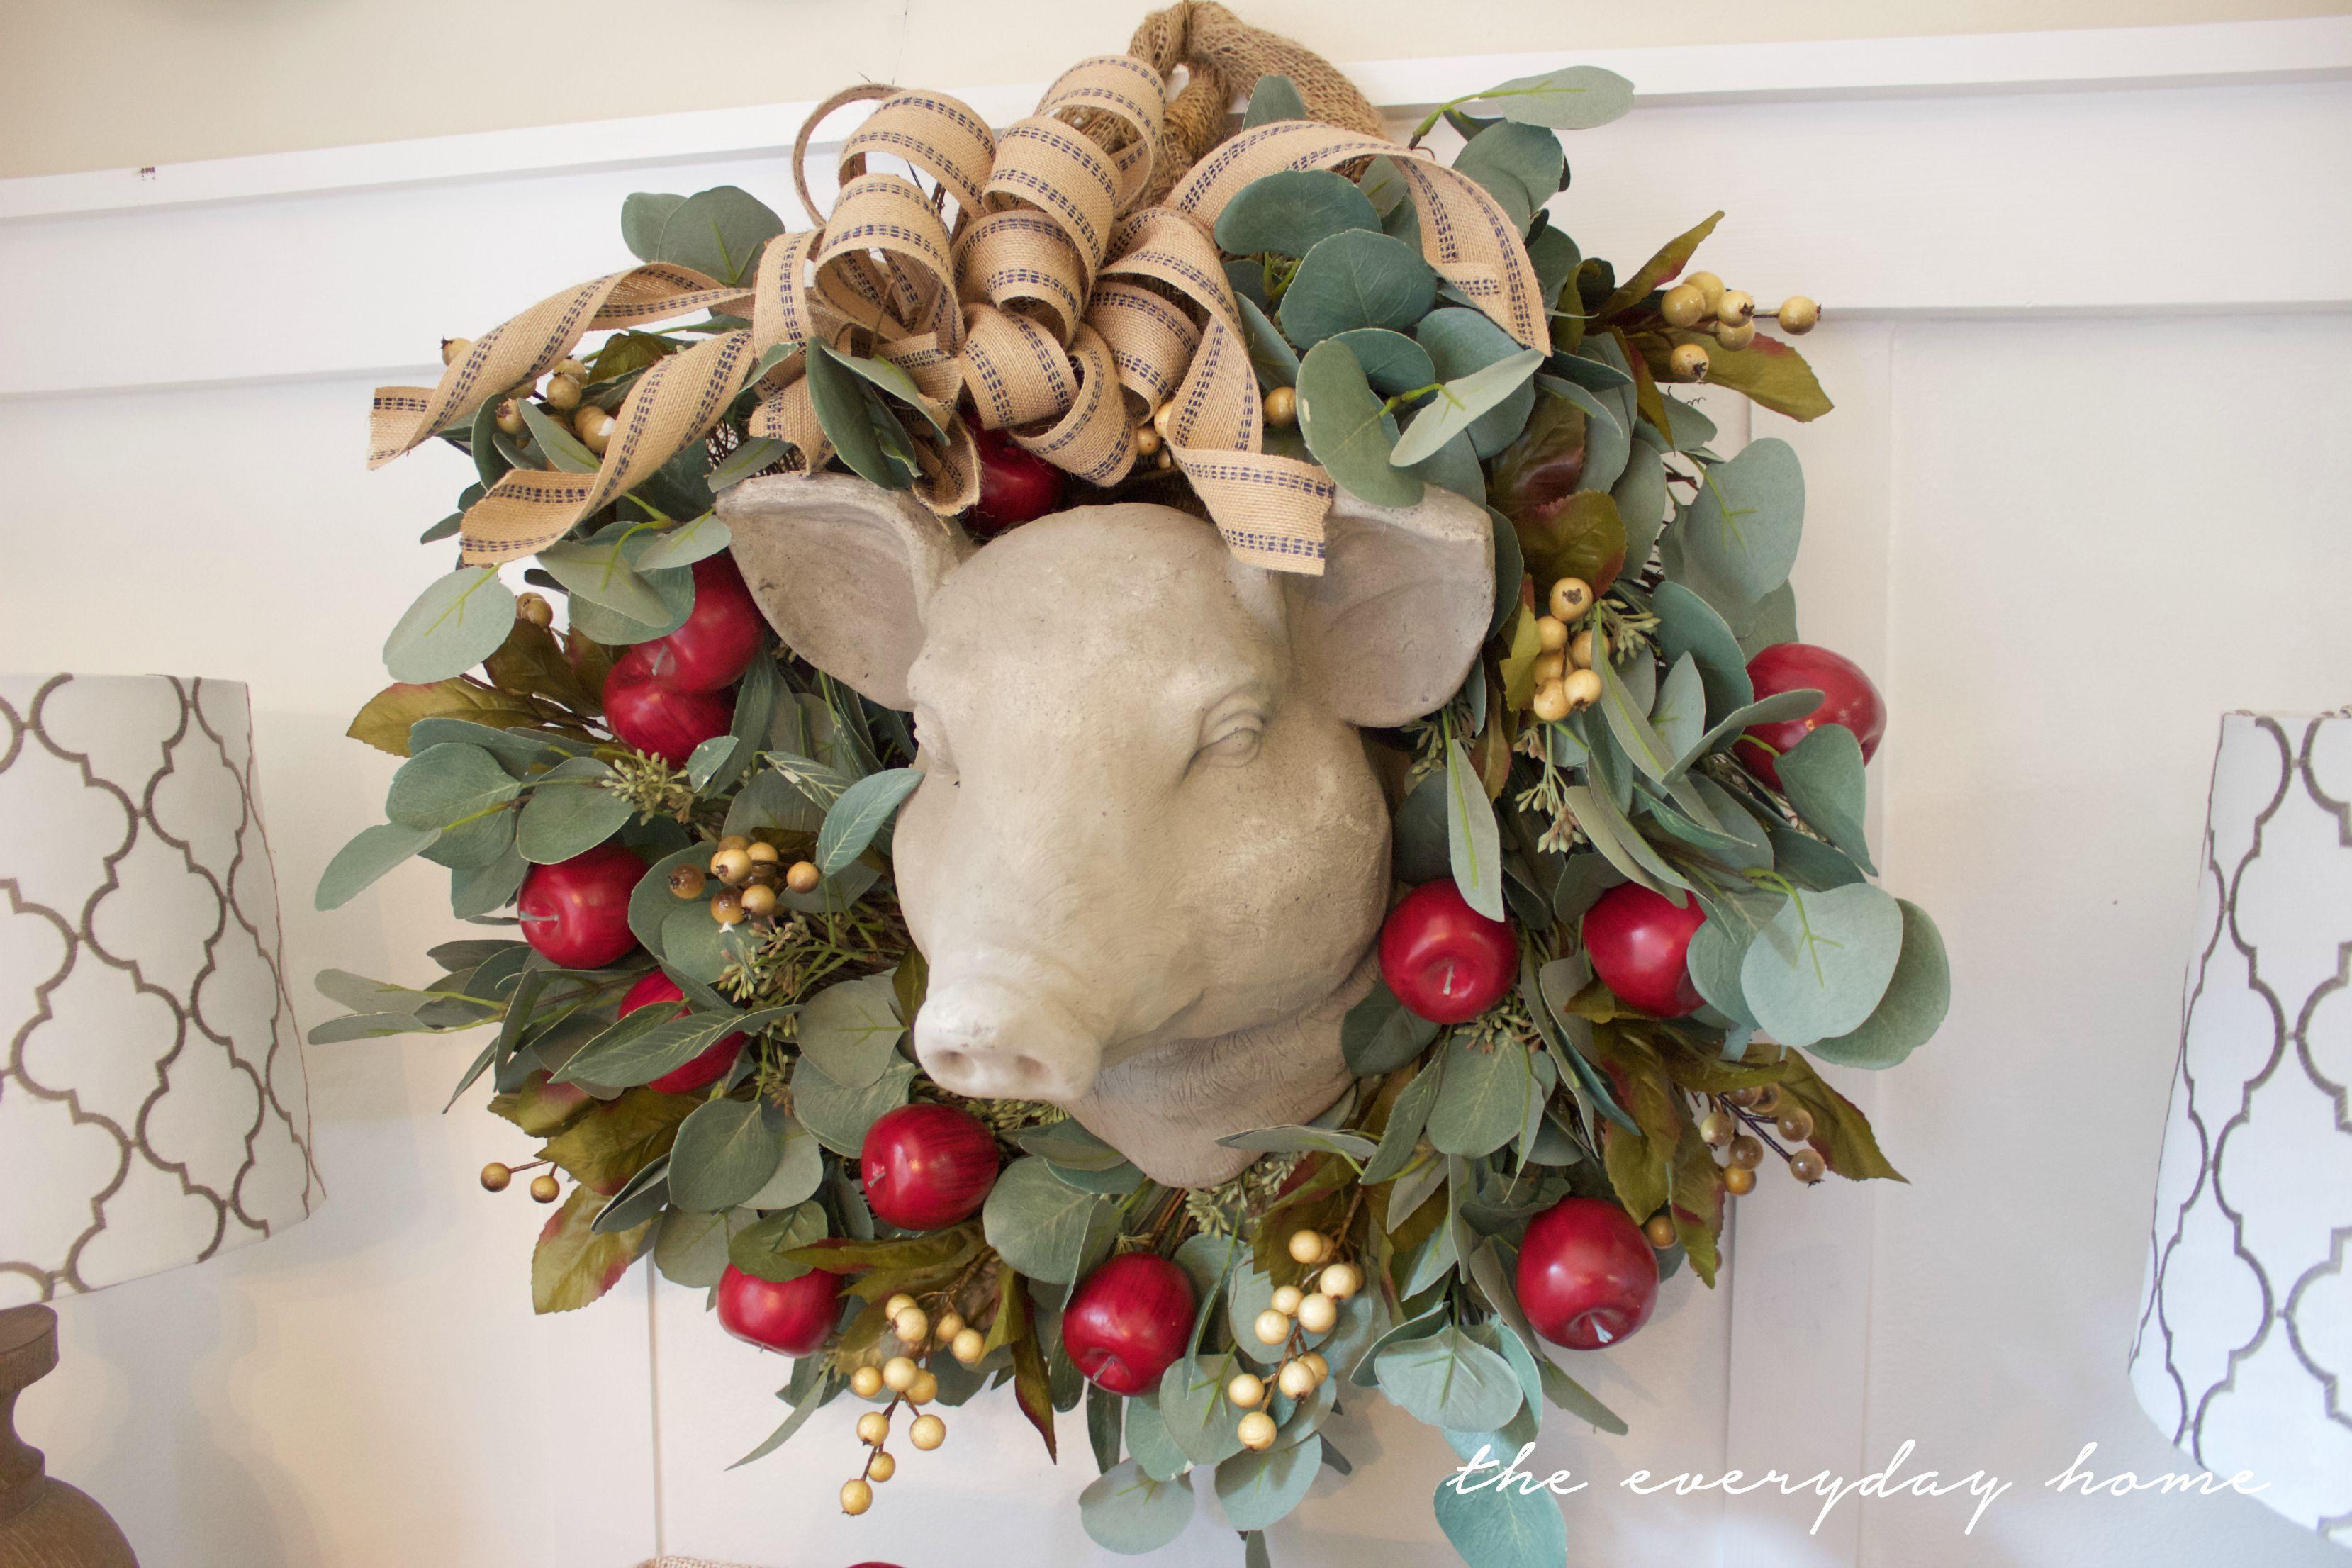 Making an Apple Berry Wreath   The Everyday Home   www.everydayhomeblog.com